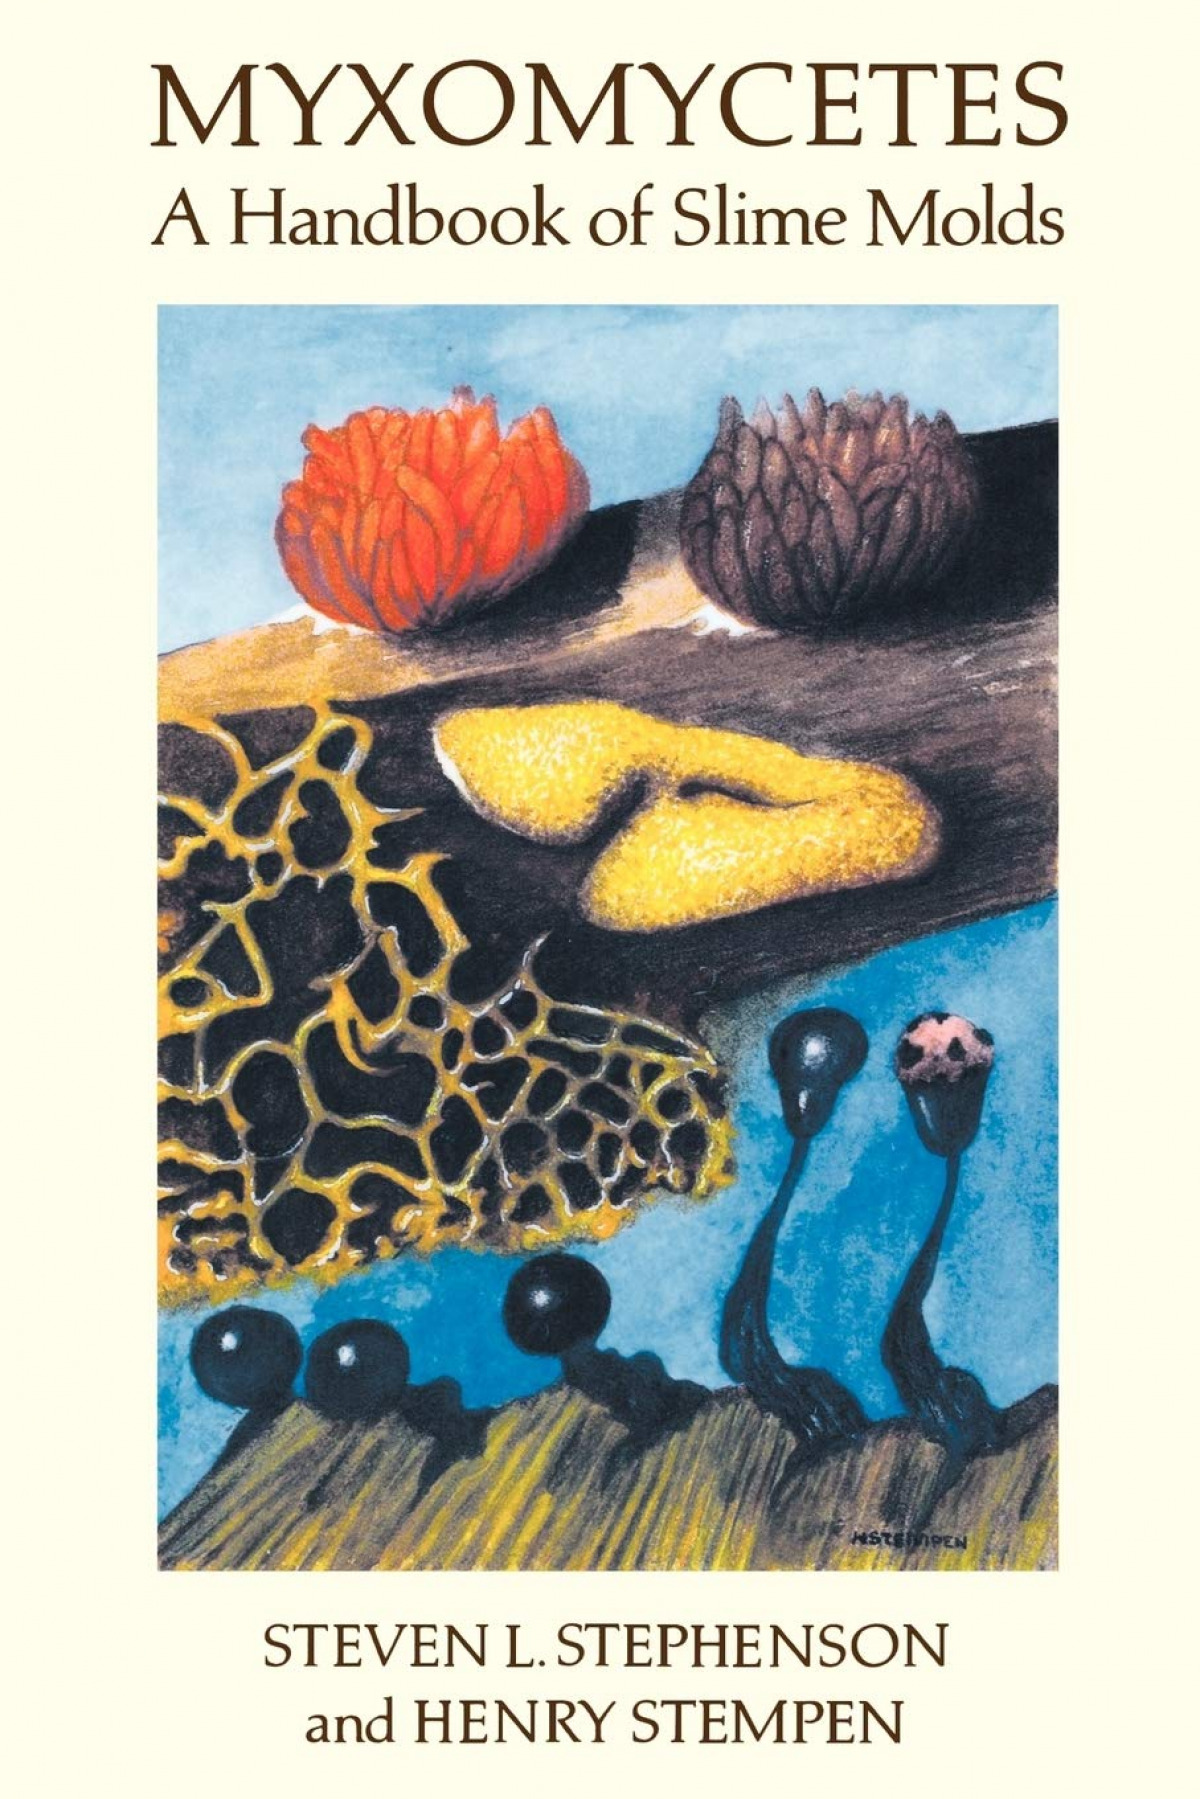 Myxomycetes.handbook of slime molds